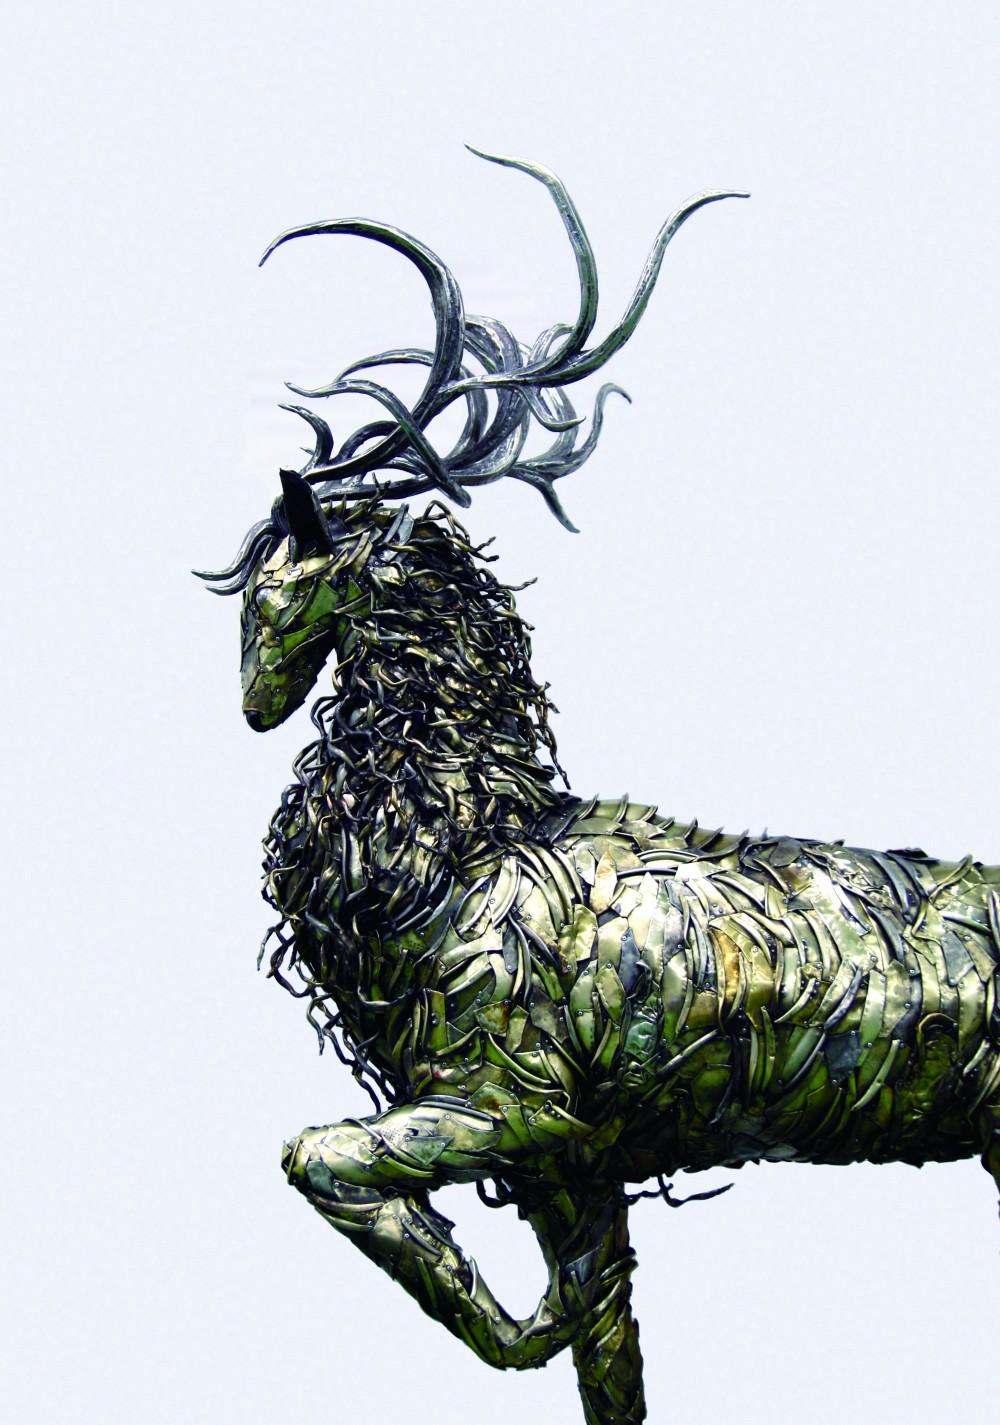 Regenesis-Red deer _ 250 x 155 x 288cm _ 버려진양은냄비, 리벳, 철, 스테인리스 _ 2016